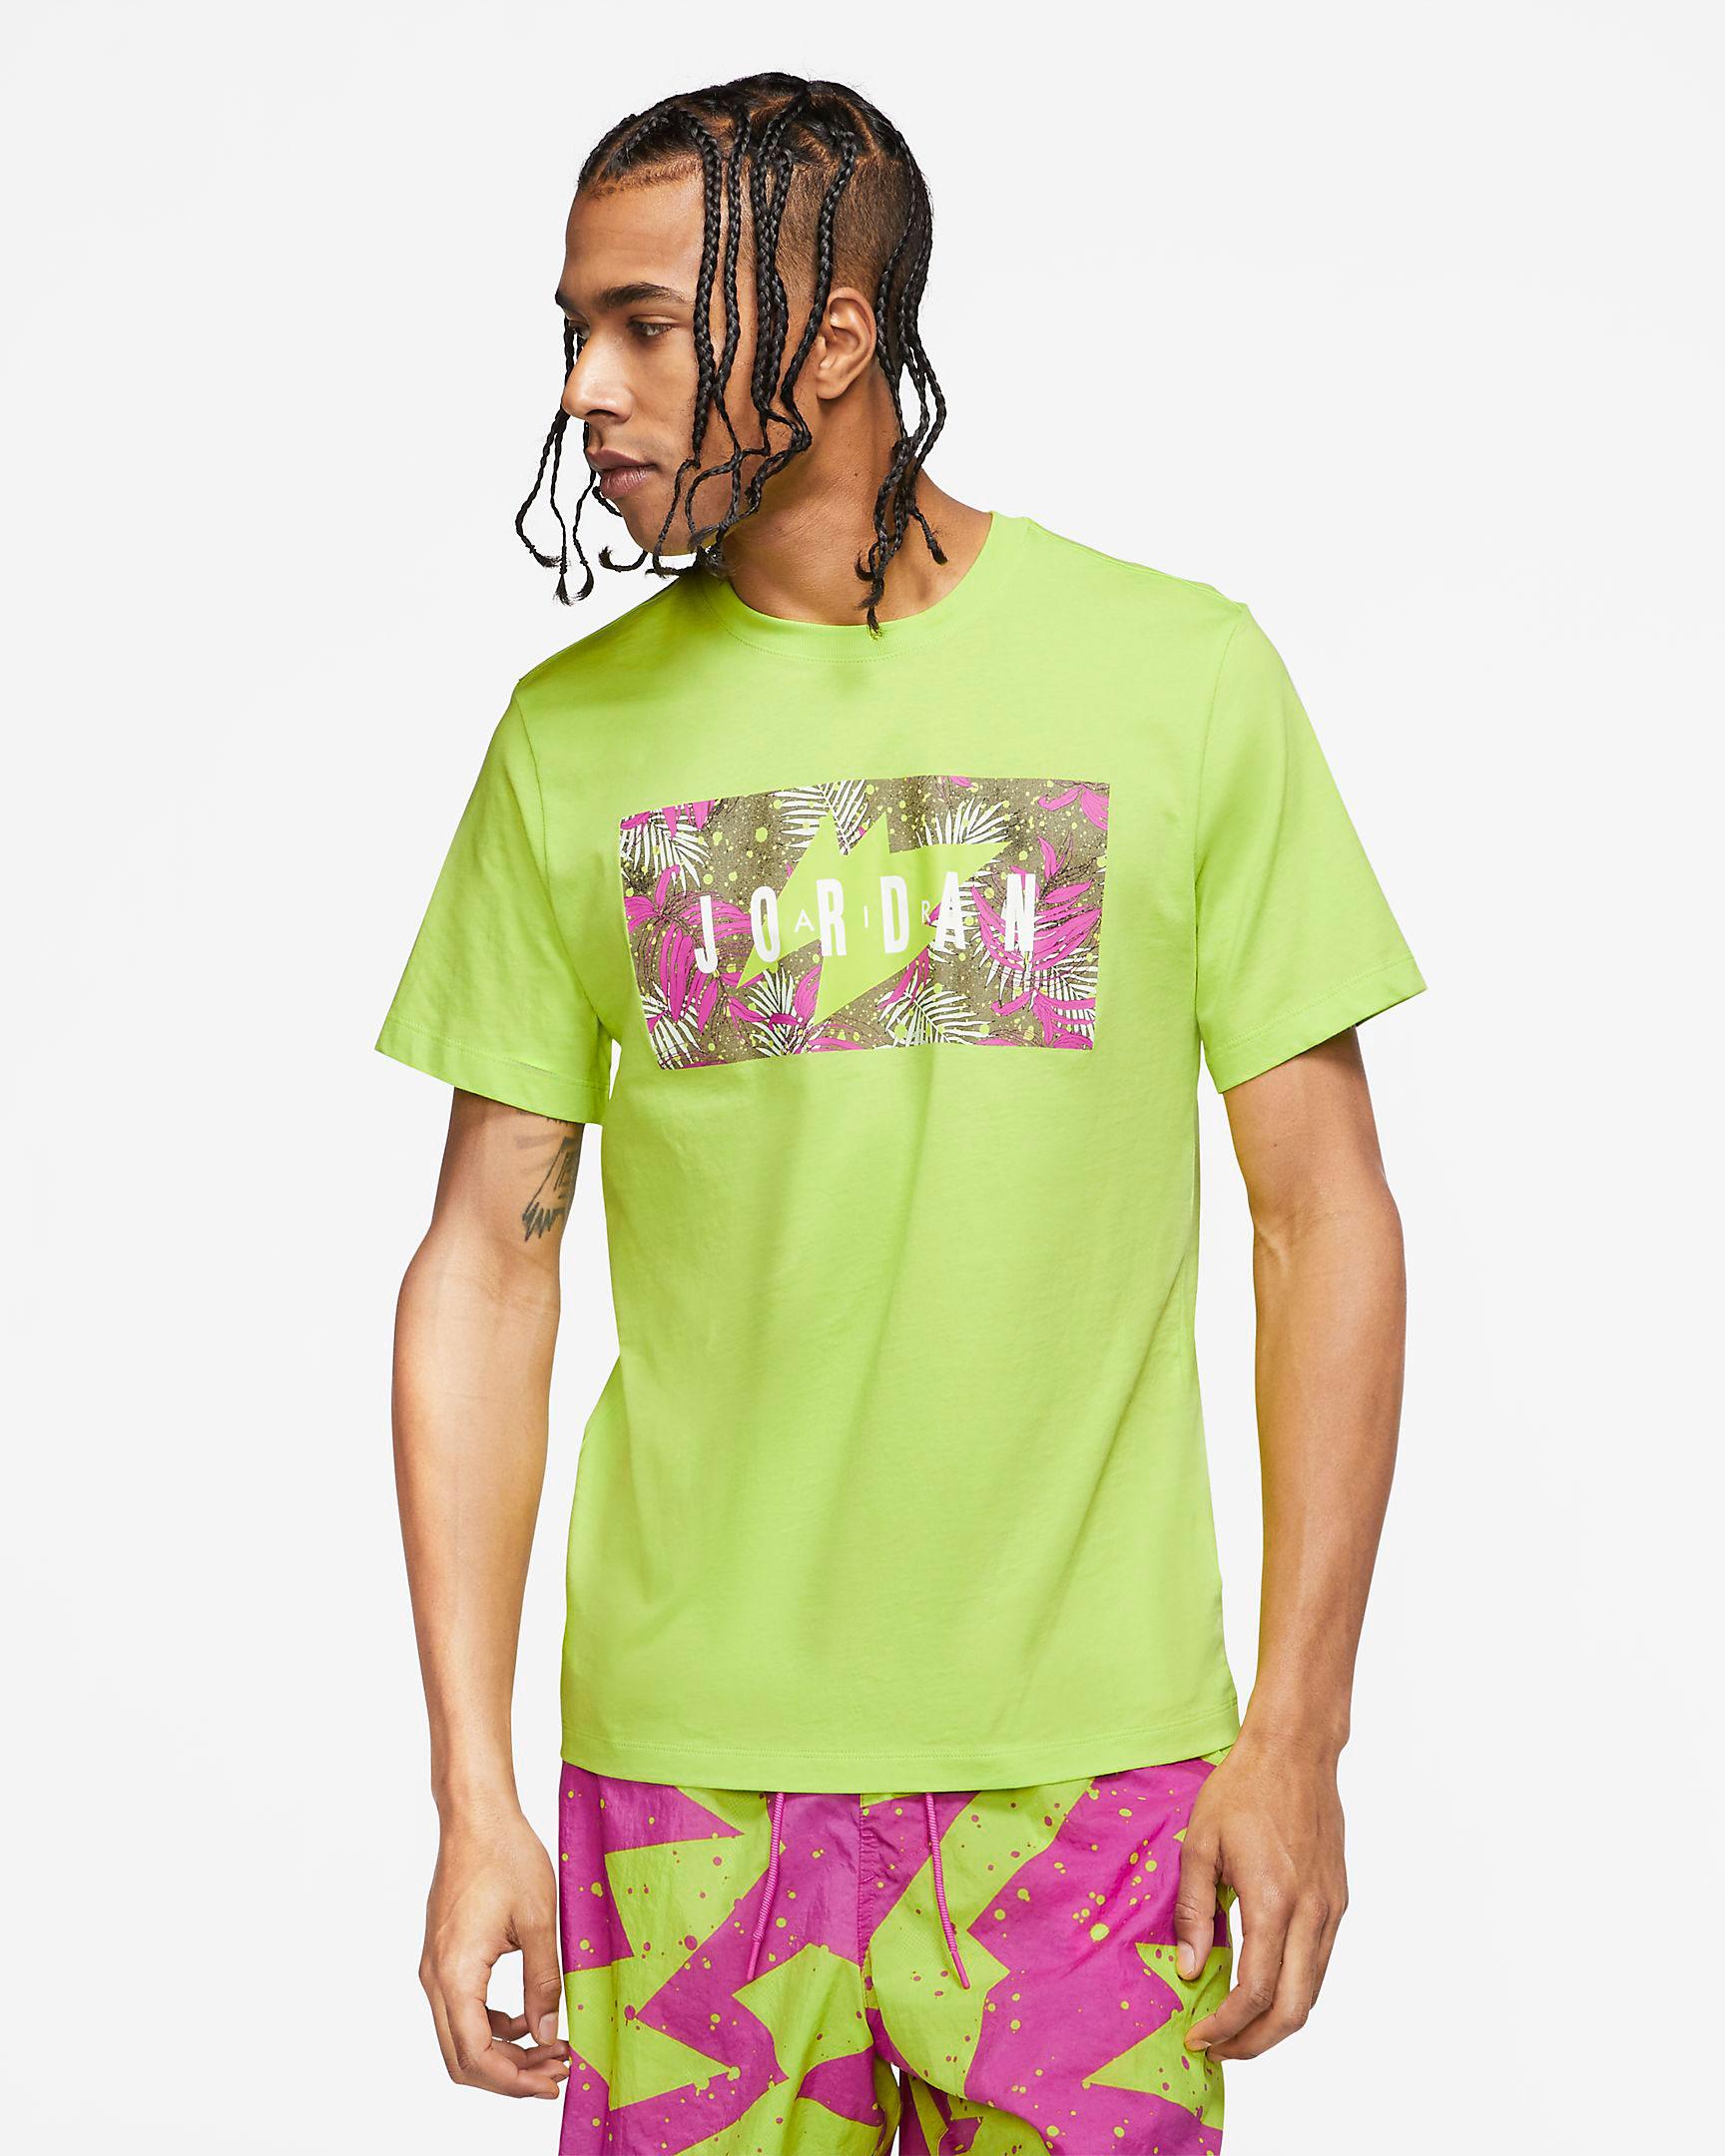 air-jordan-5-bel-air-alternate-matching-t-shirt